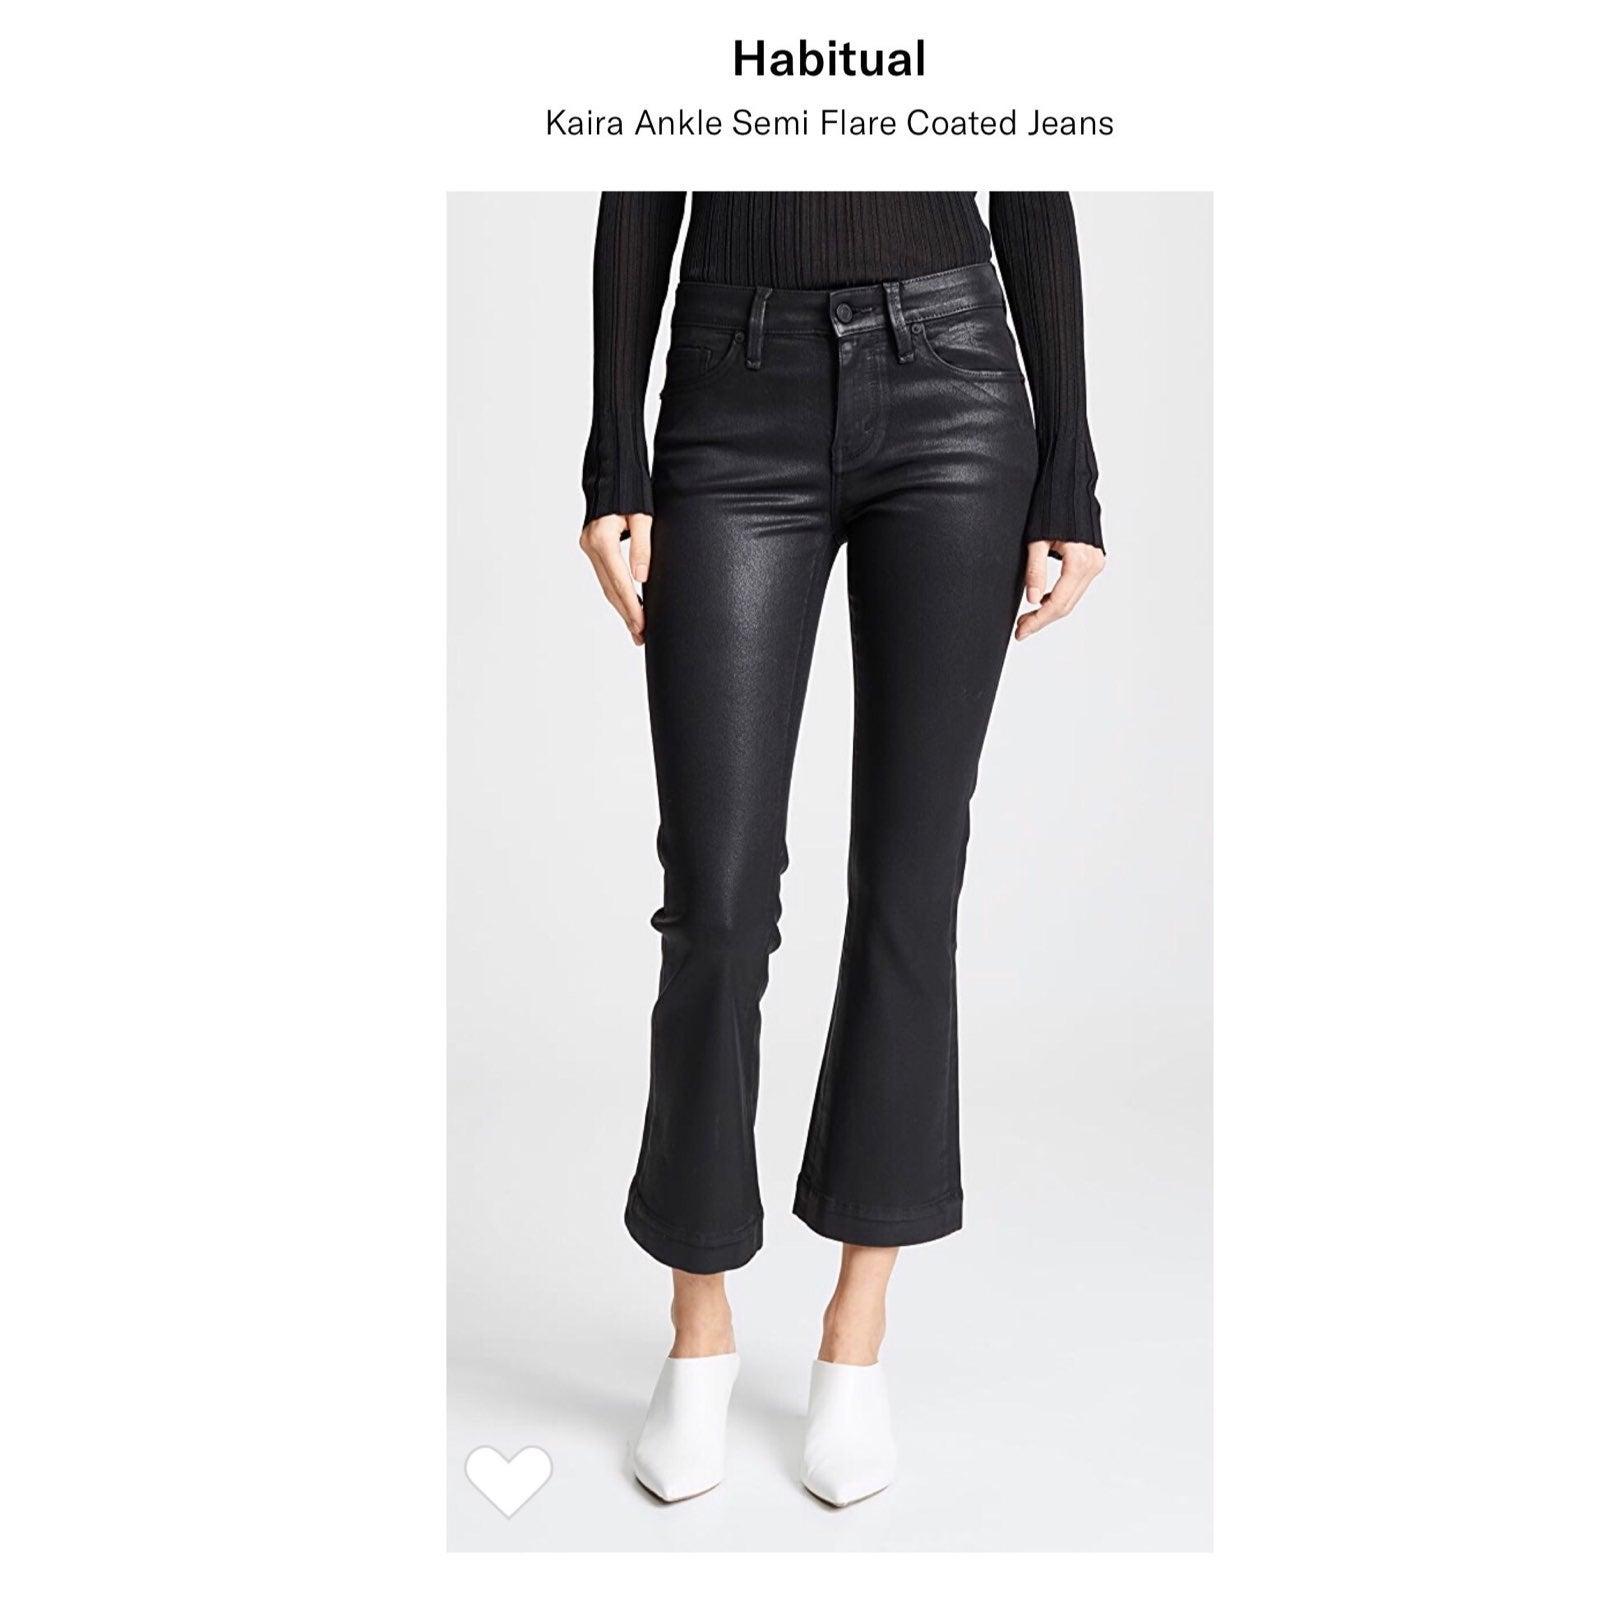 Habitual kaira cropped flared black jean